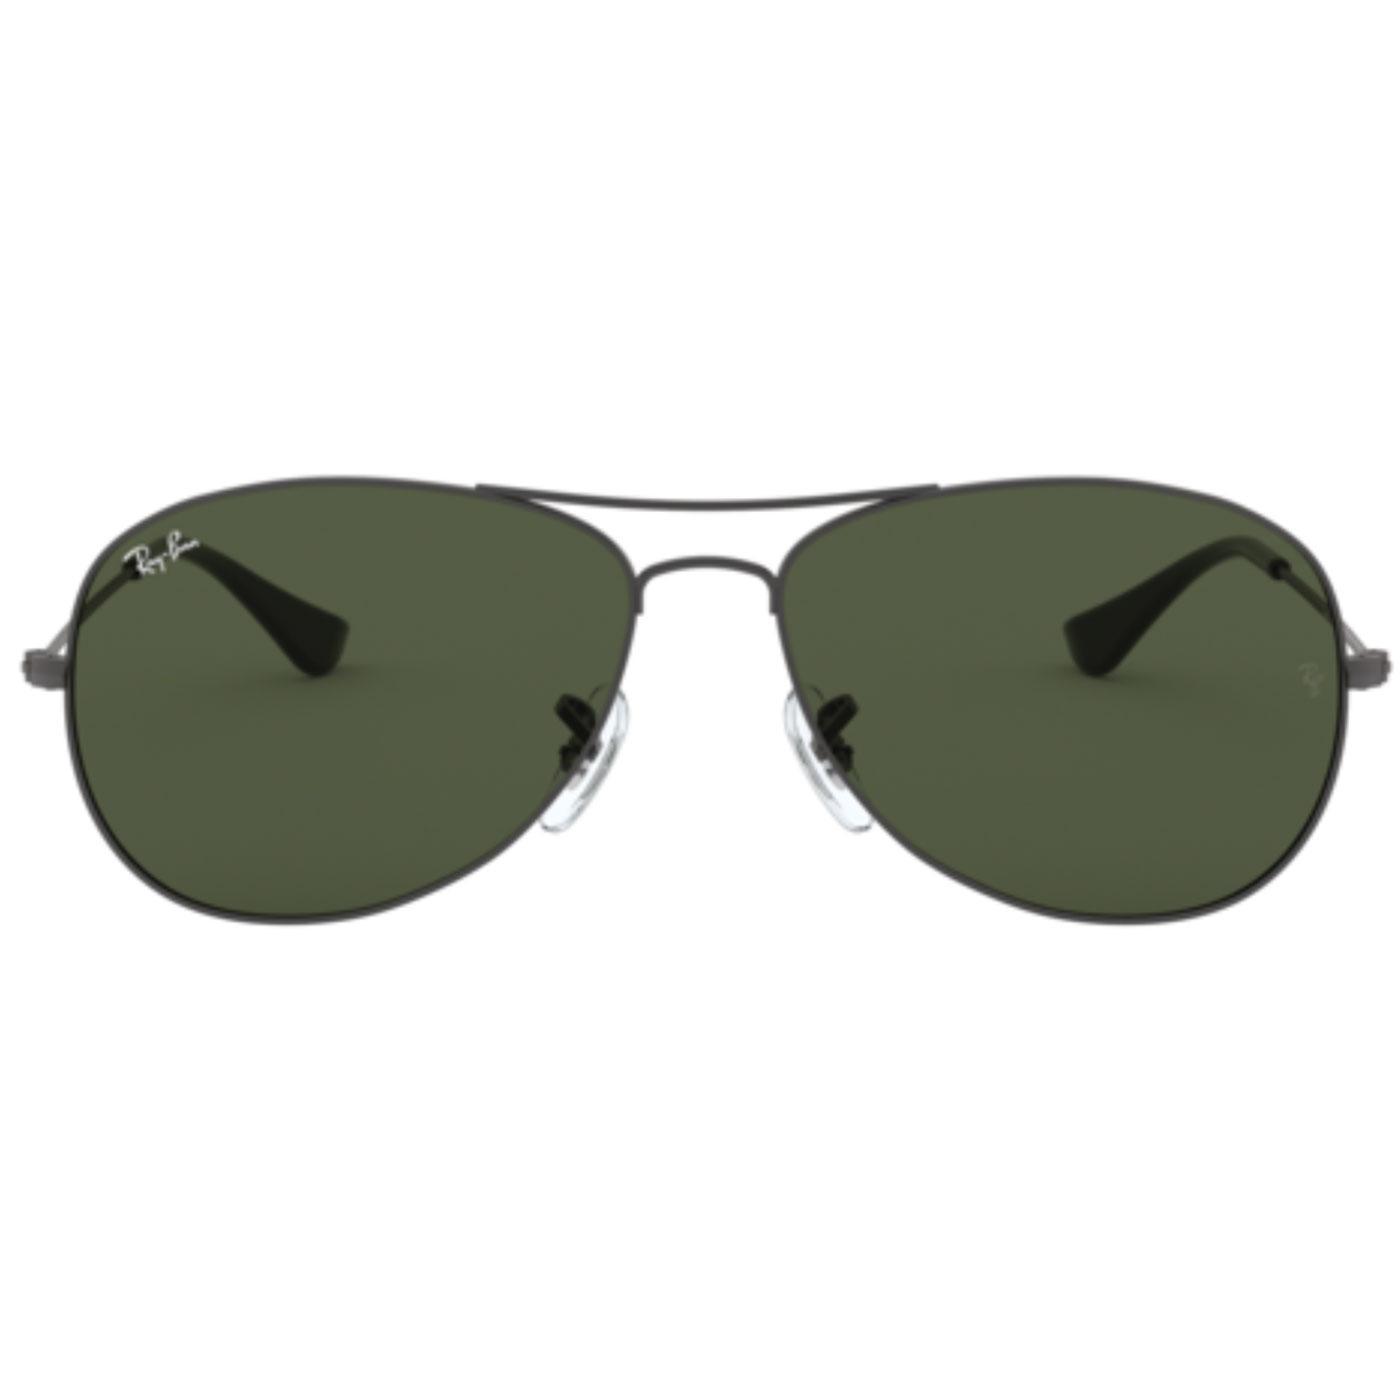 Cockpit Ray-Ban Retro Indie Mod Aviator Sunglasses